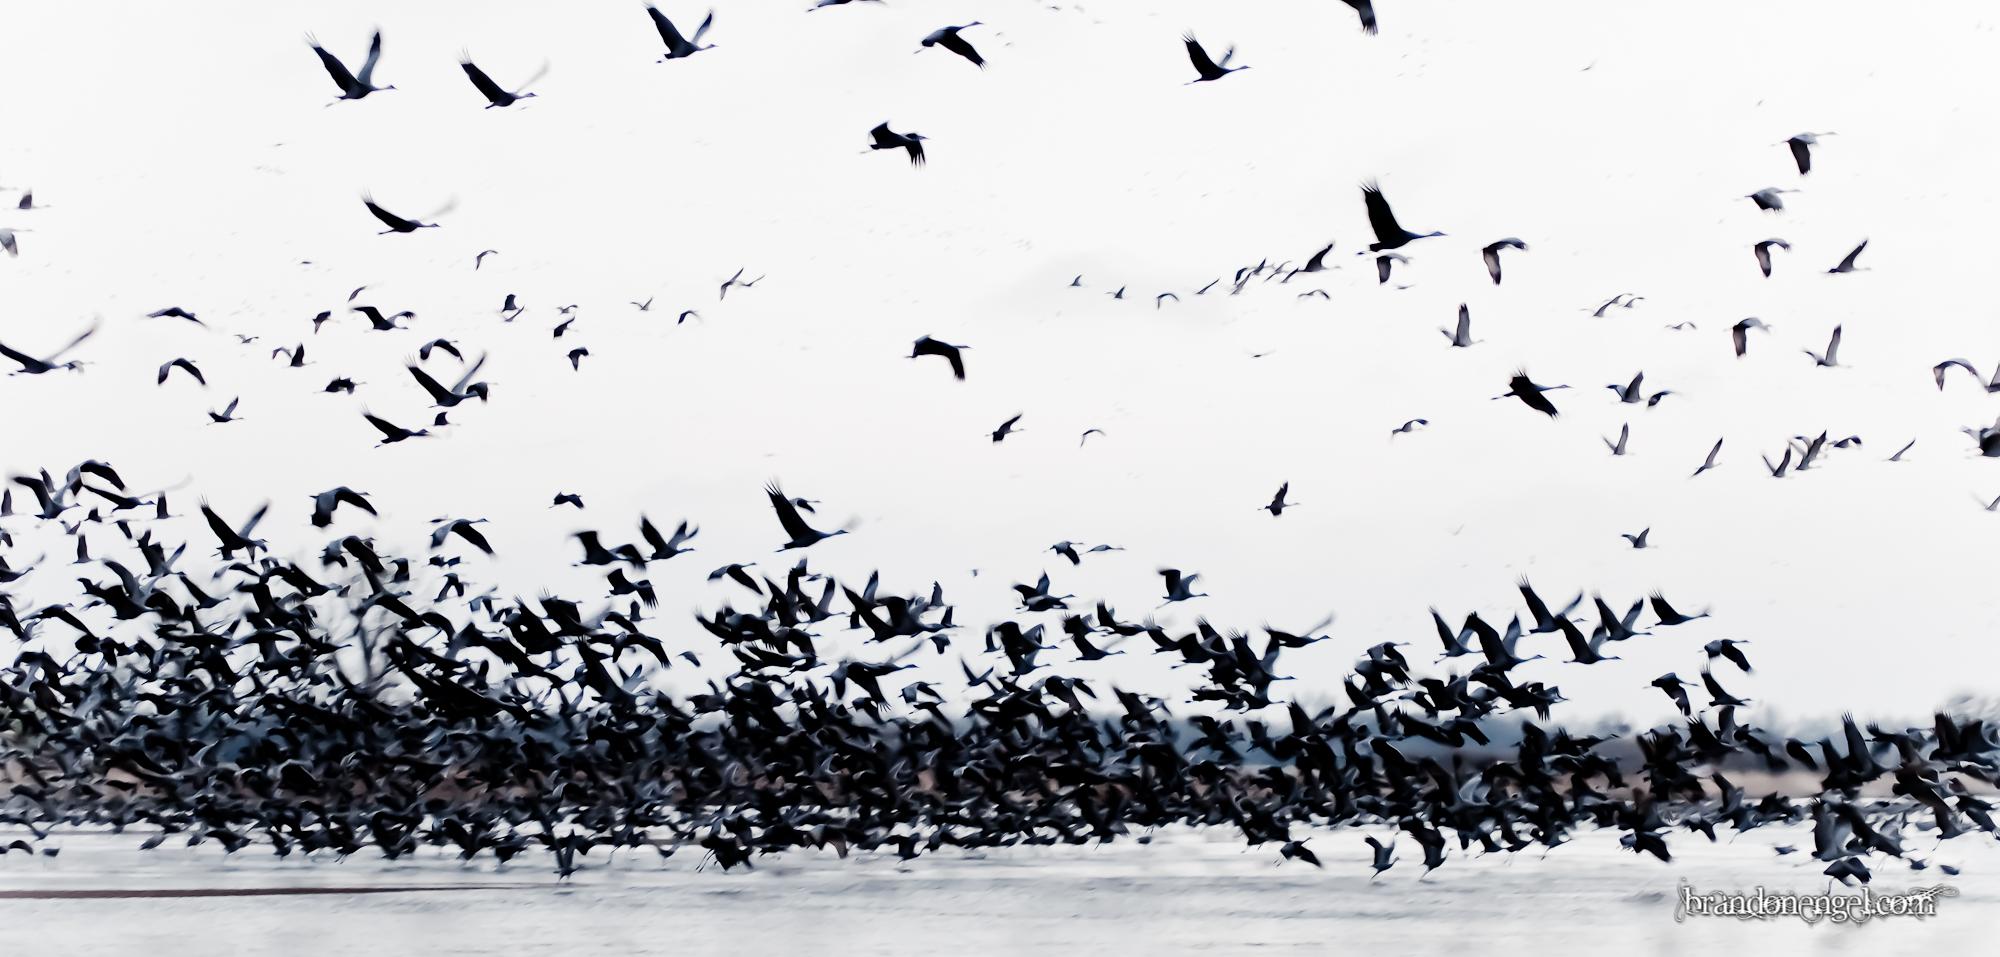 Cranes Take Flight.